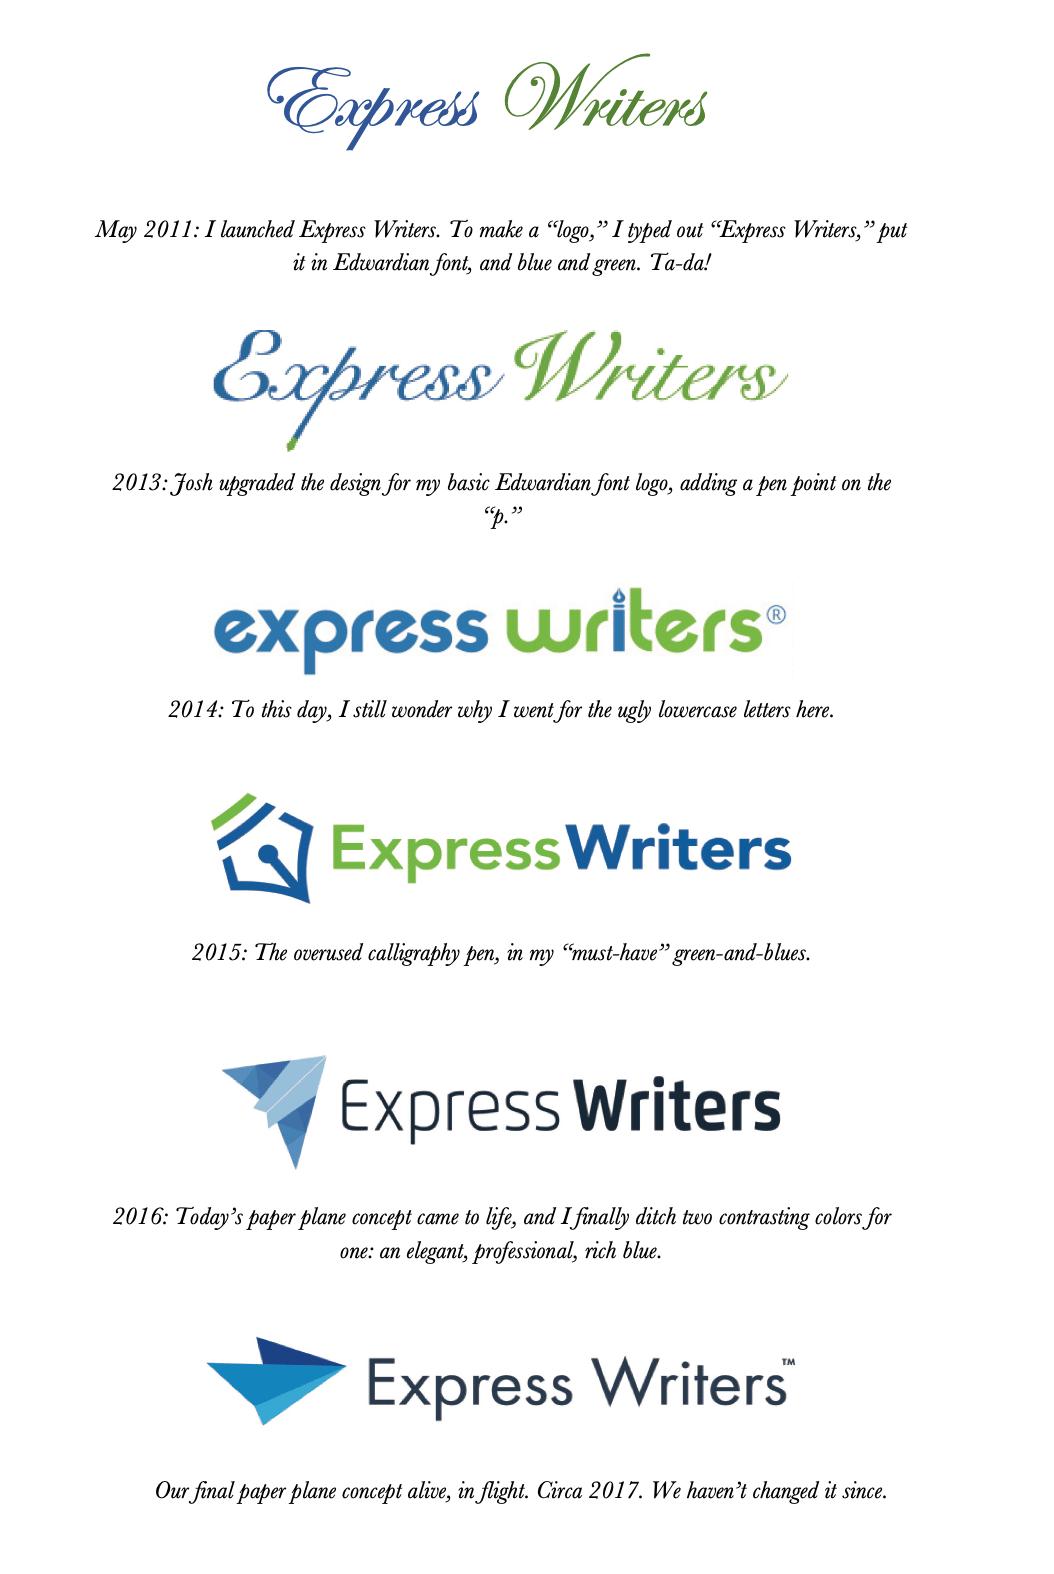 express writers branding